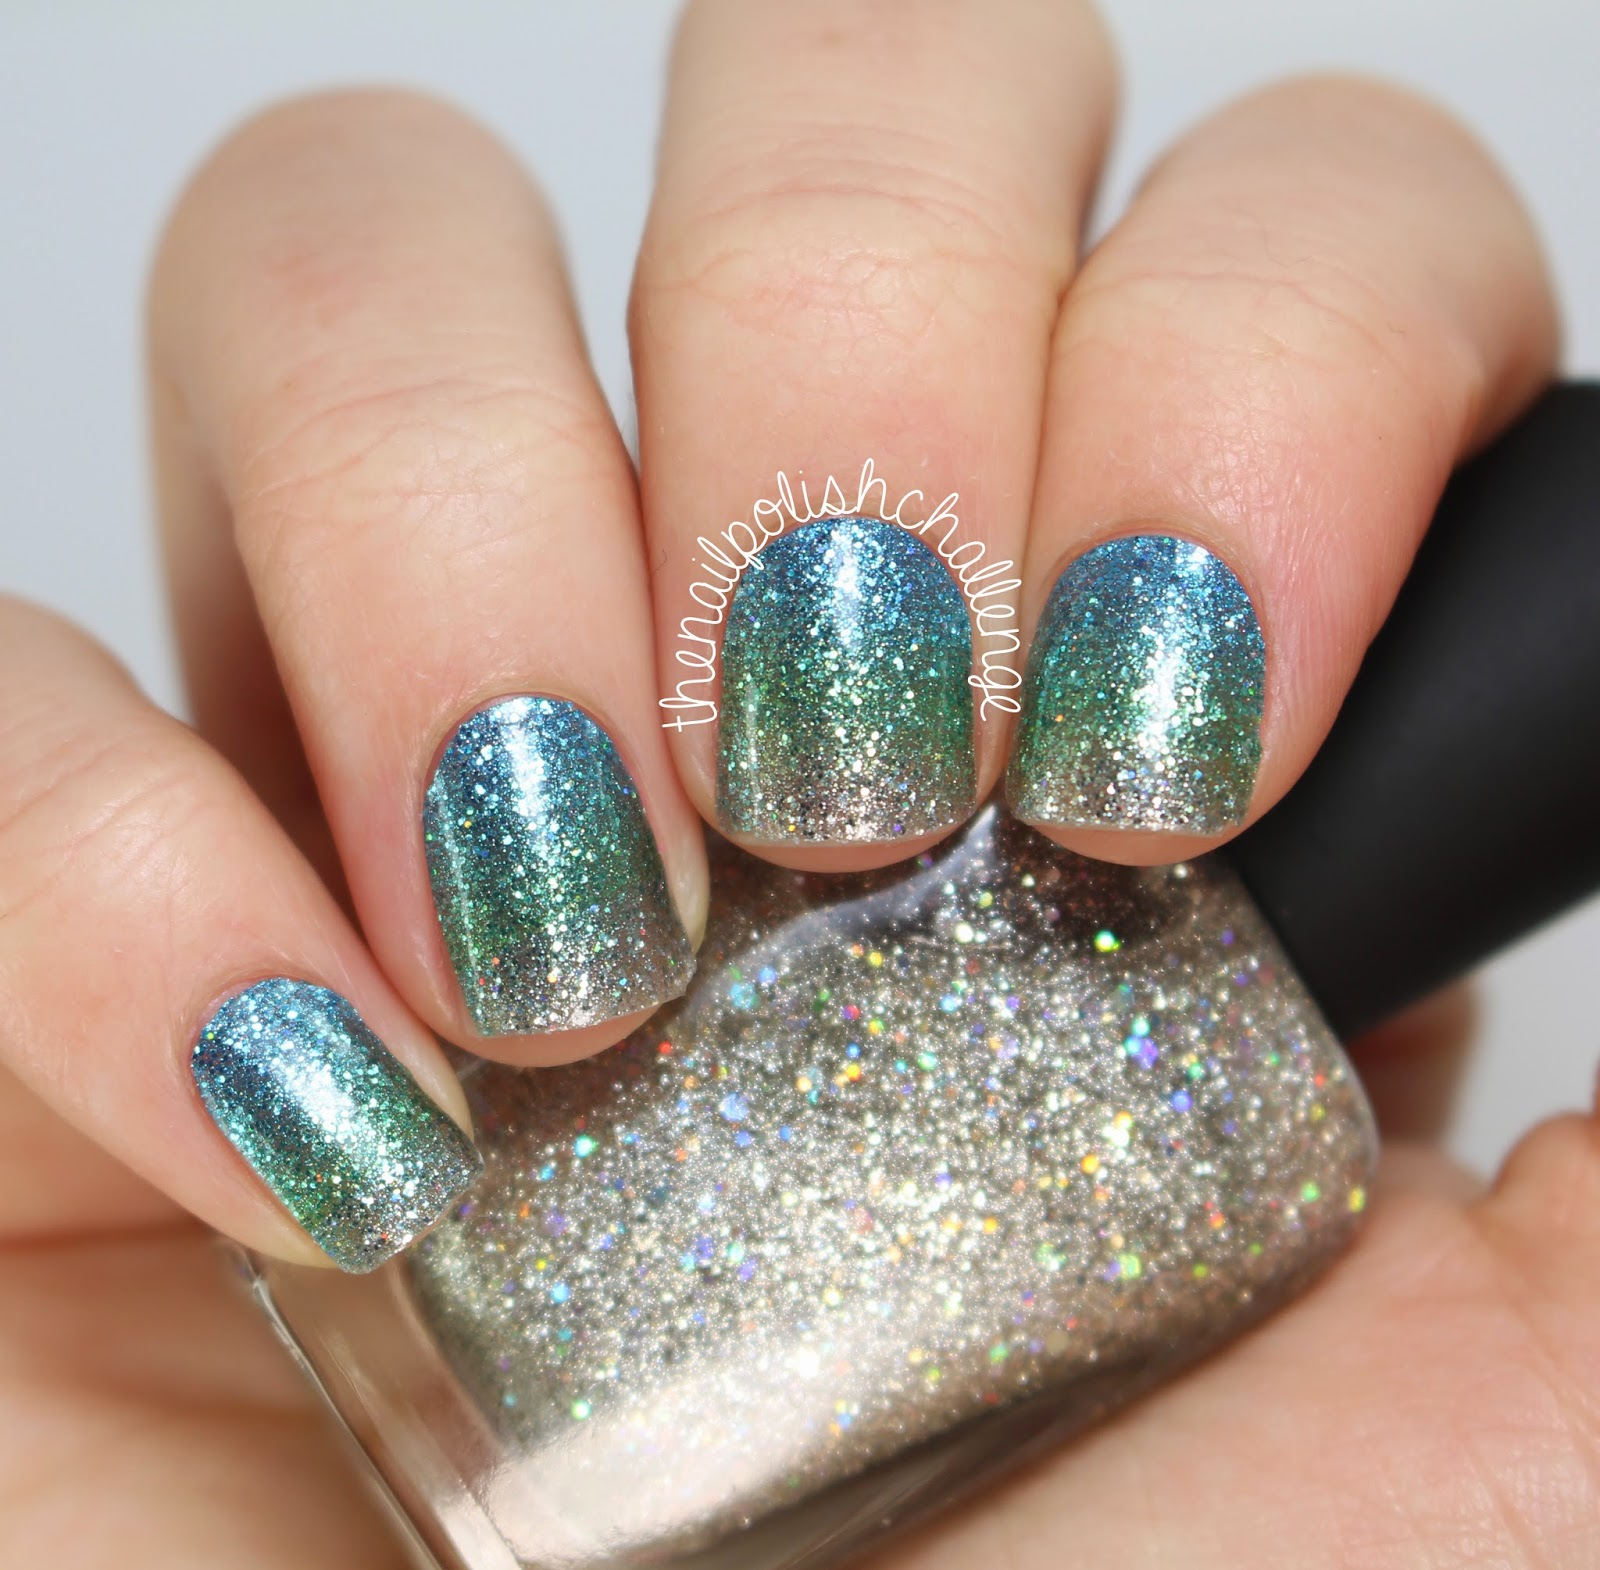 Kelli Marissa: Incoco Nail Polish Appliques: Review